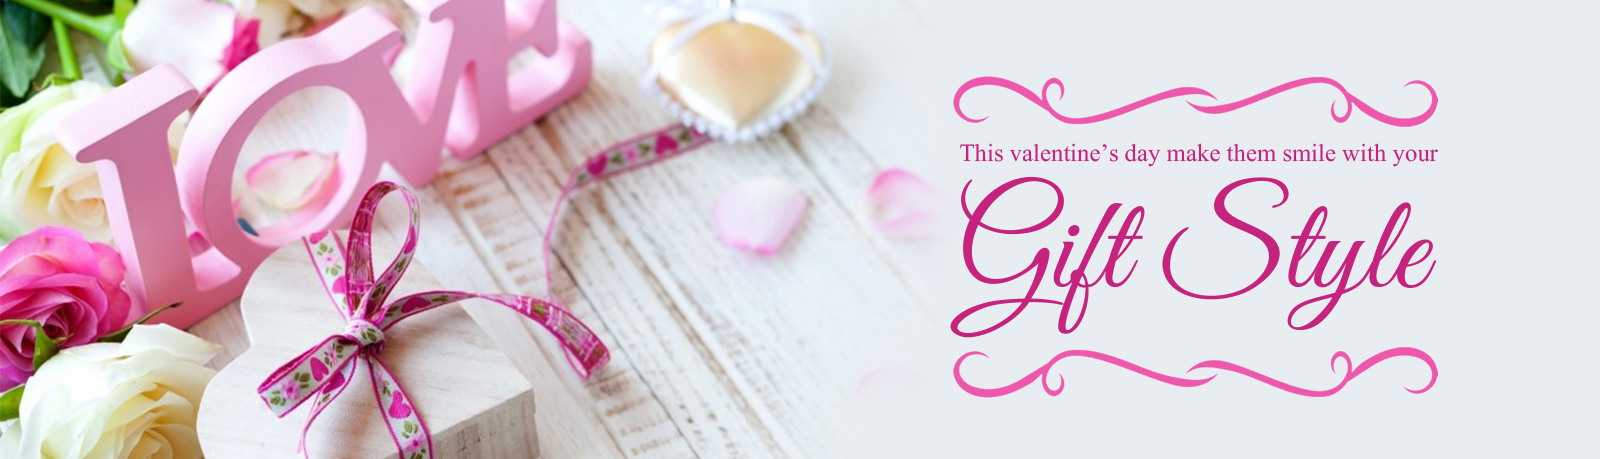 valentine's day gifts - buy/send best valentines day gifts online, Ideas